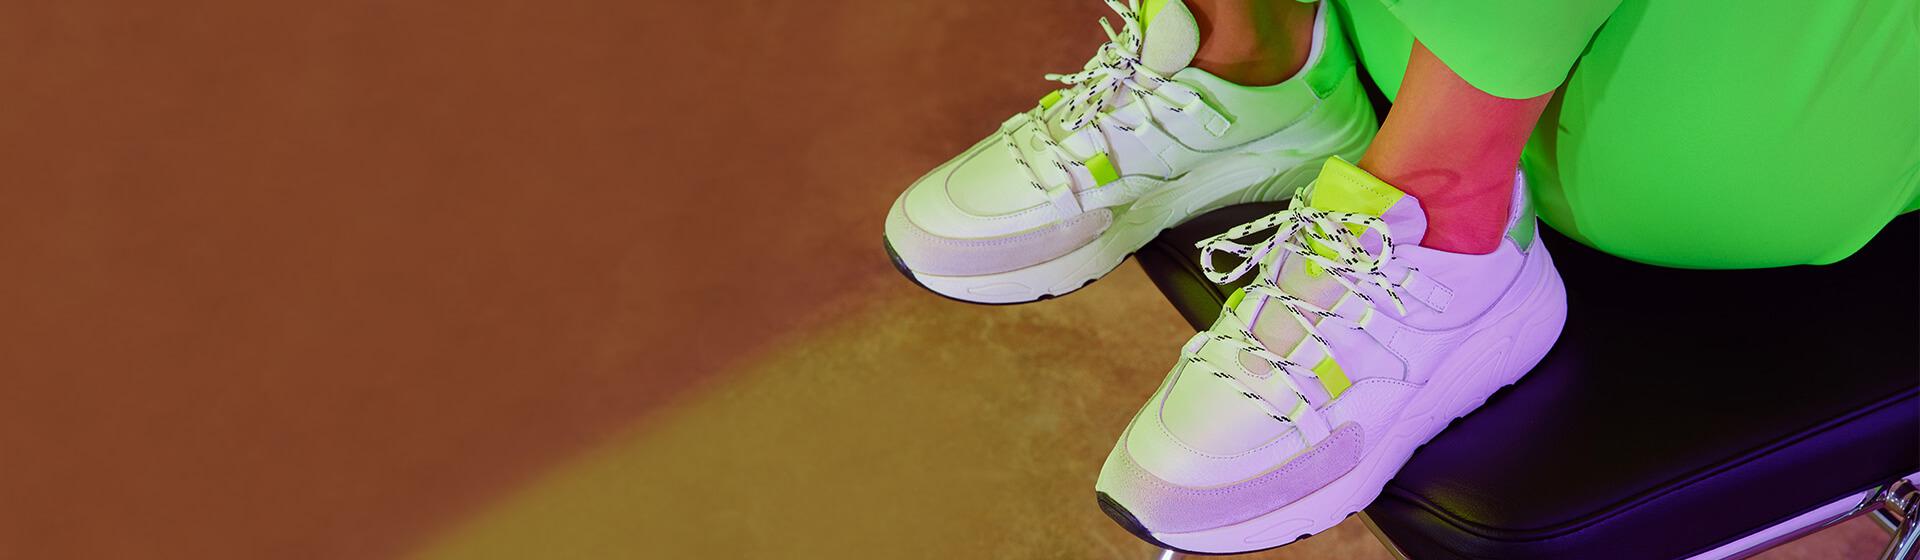 Schuhe Neonfarben